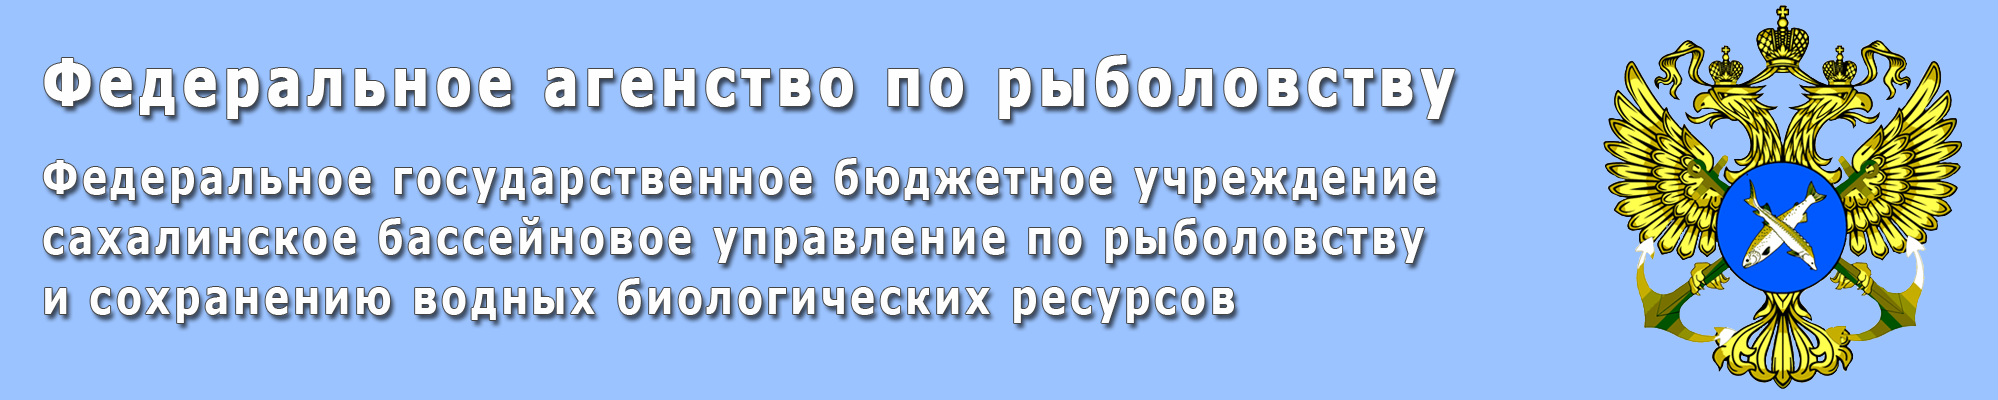 ФГБУ «Сахалинрыбвод»